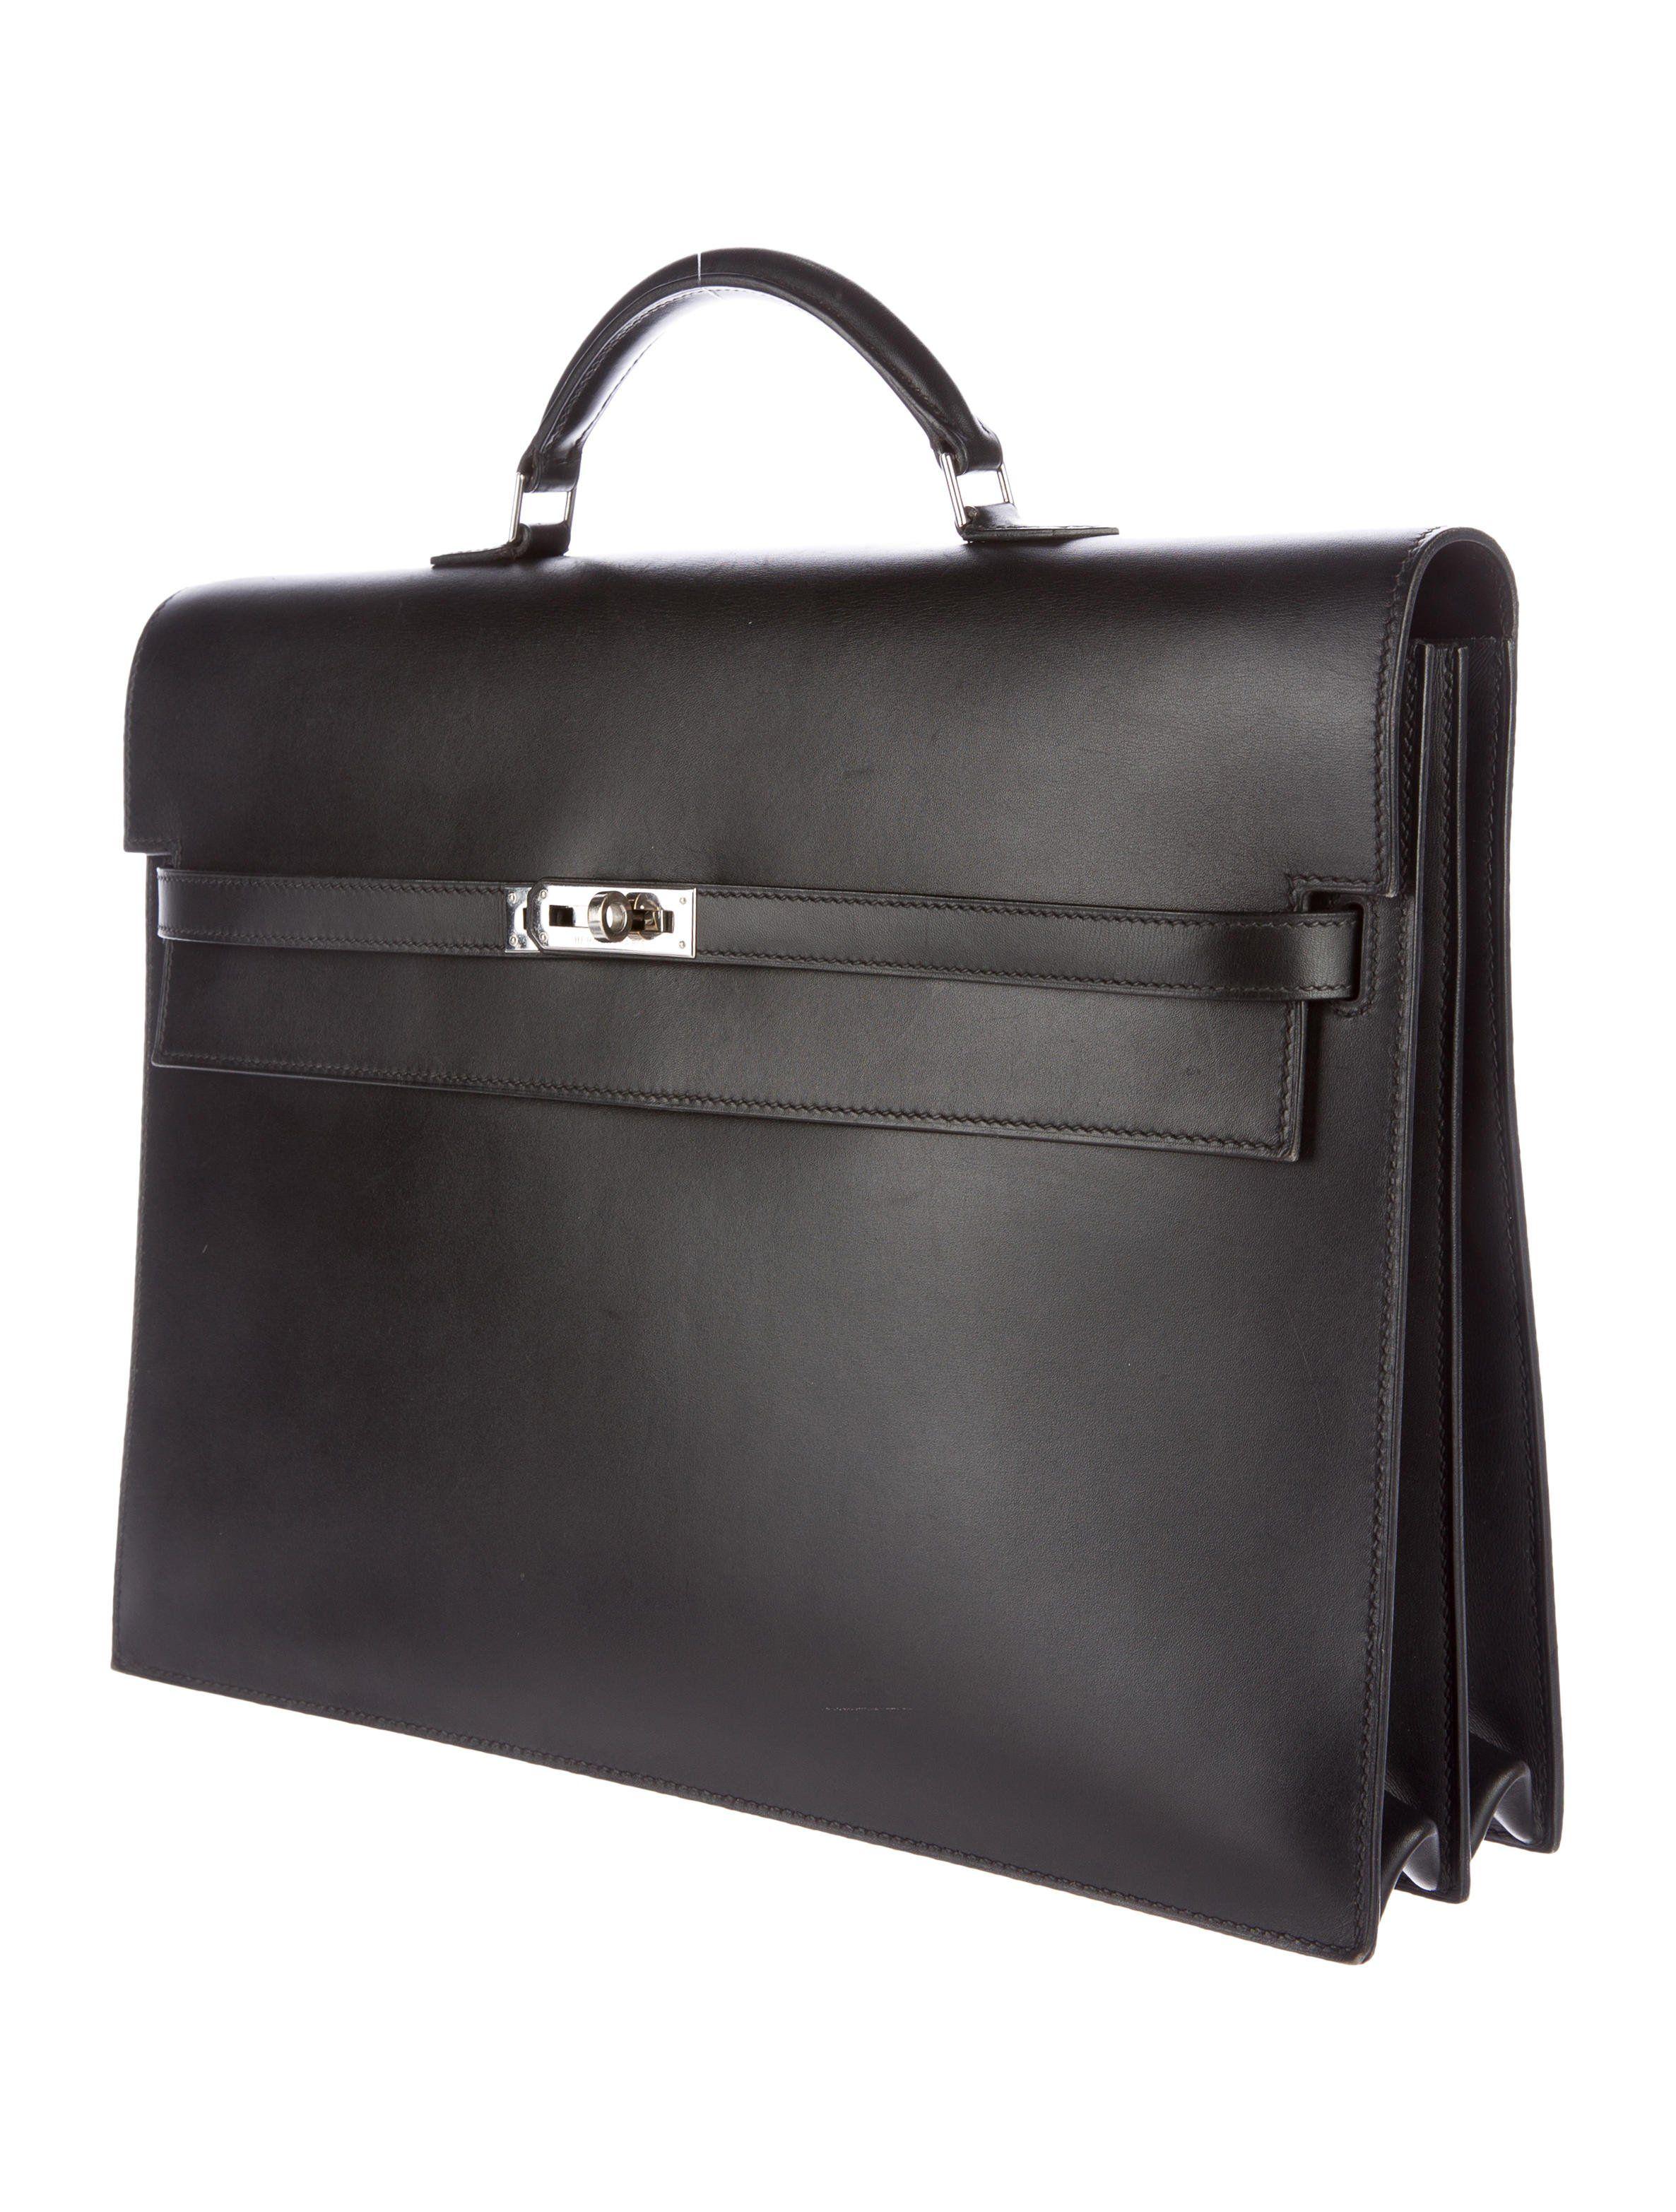 301fae394a2a kelly depeche 38 briefcase